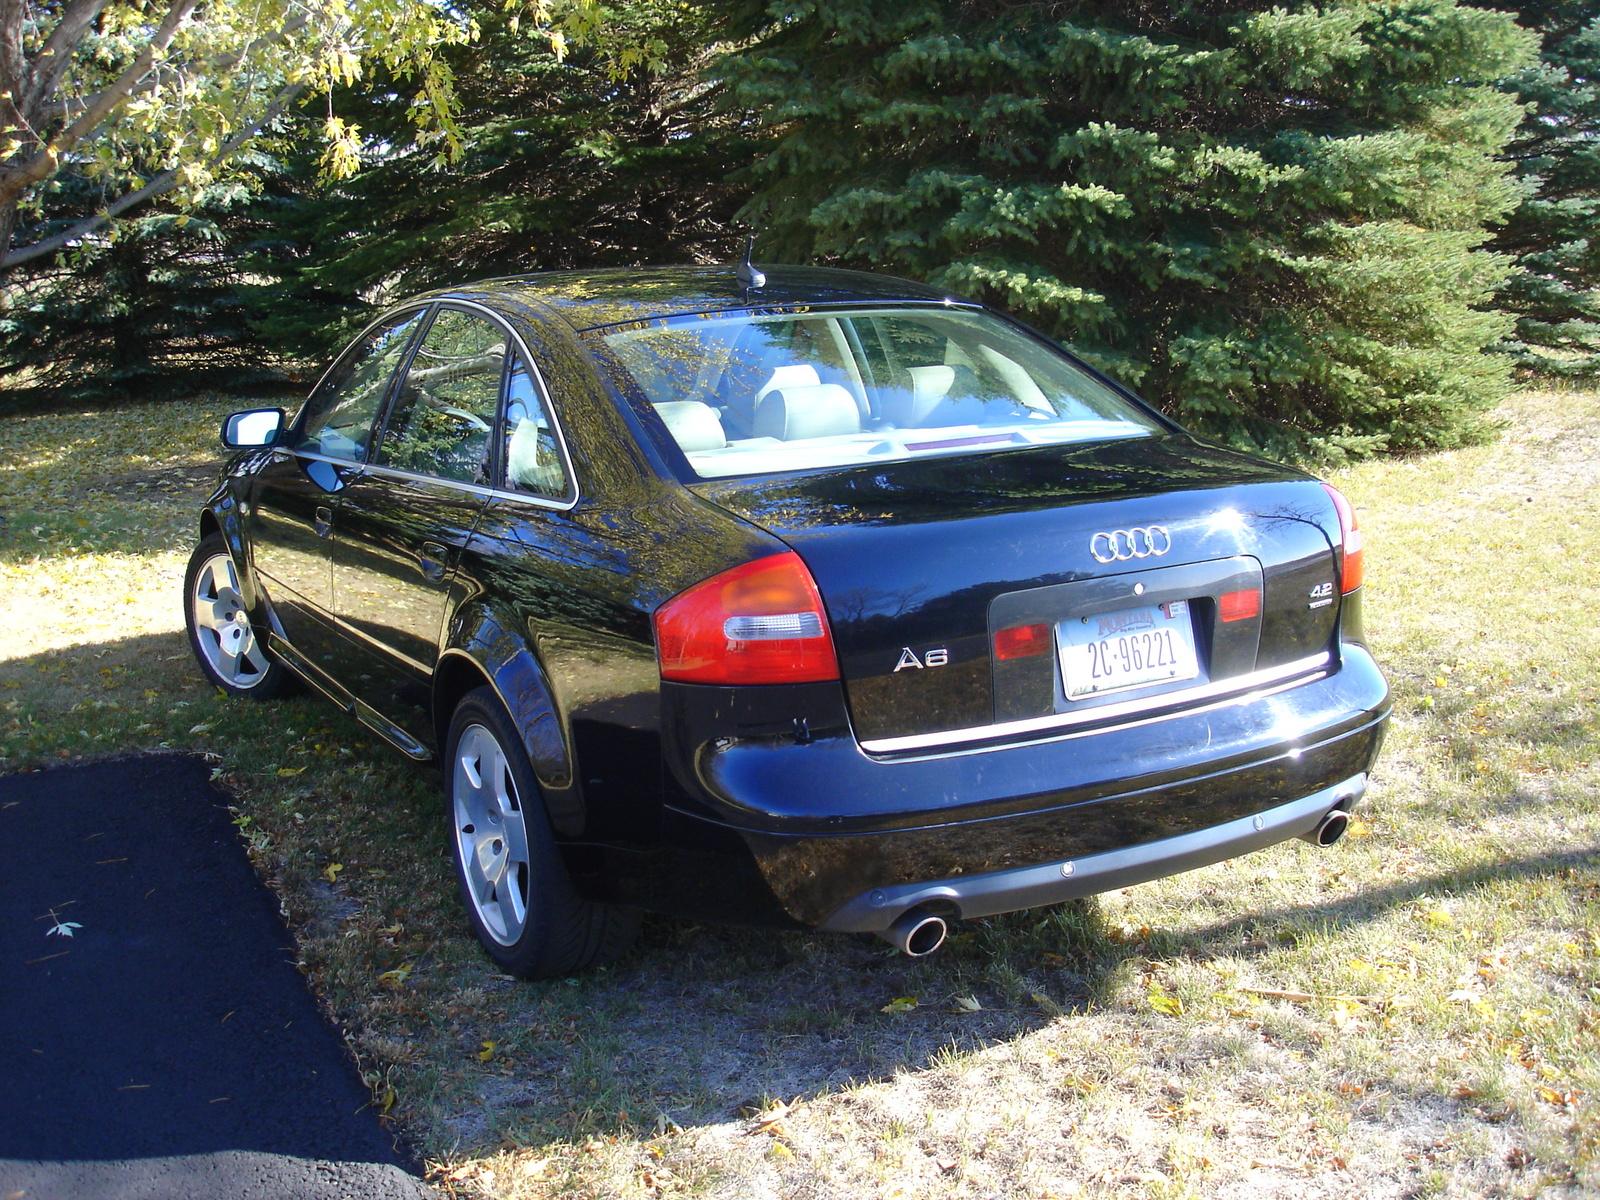 2003 Audi A6 Image 16